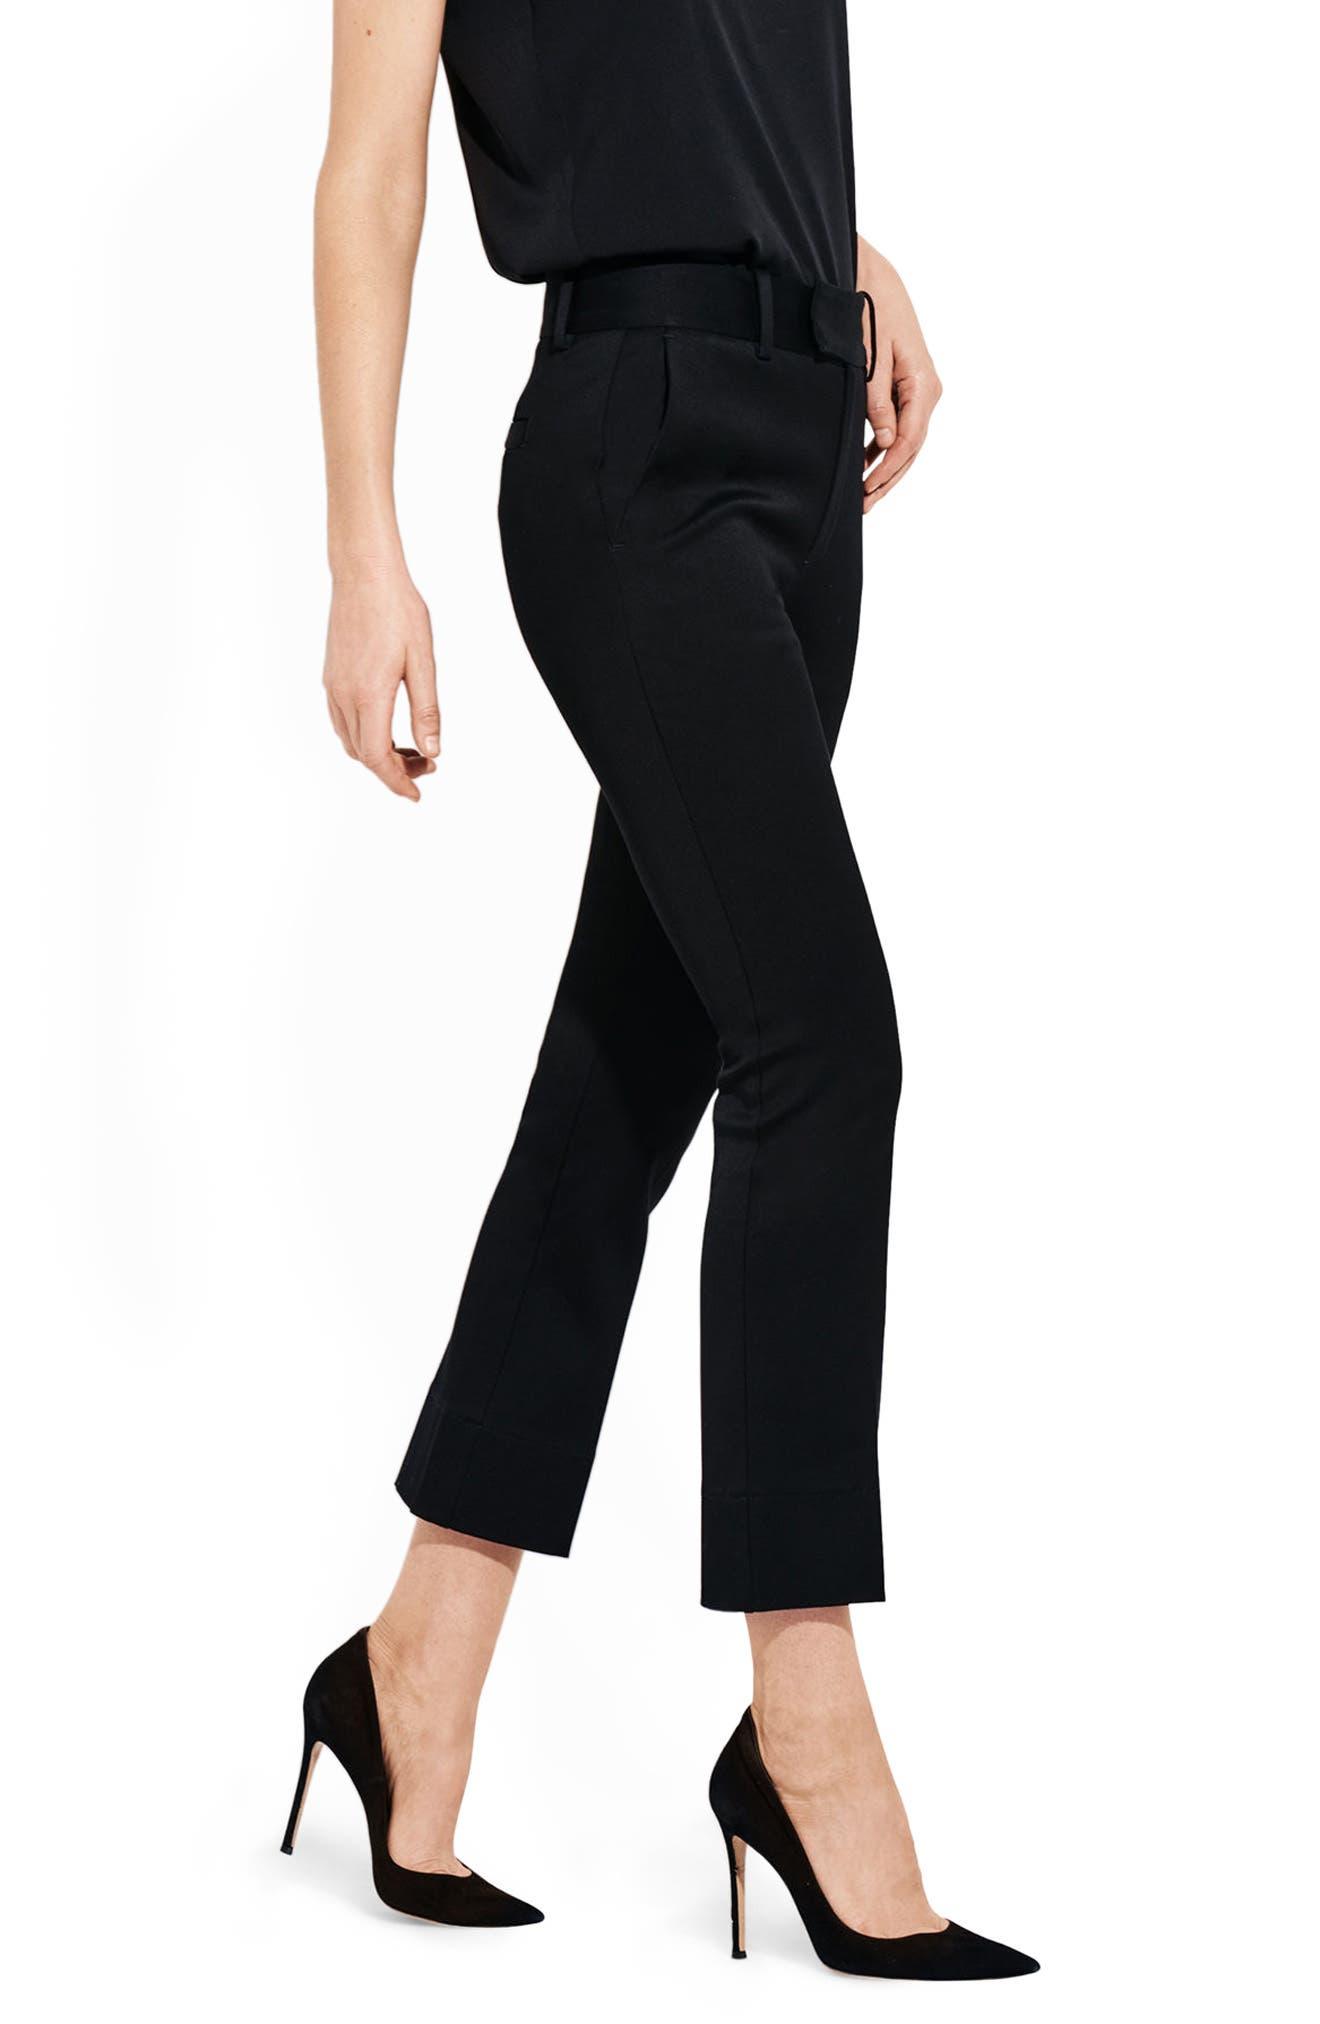 Main Image - AYR The Vault High Waist Ankle Bootcut Jeans